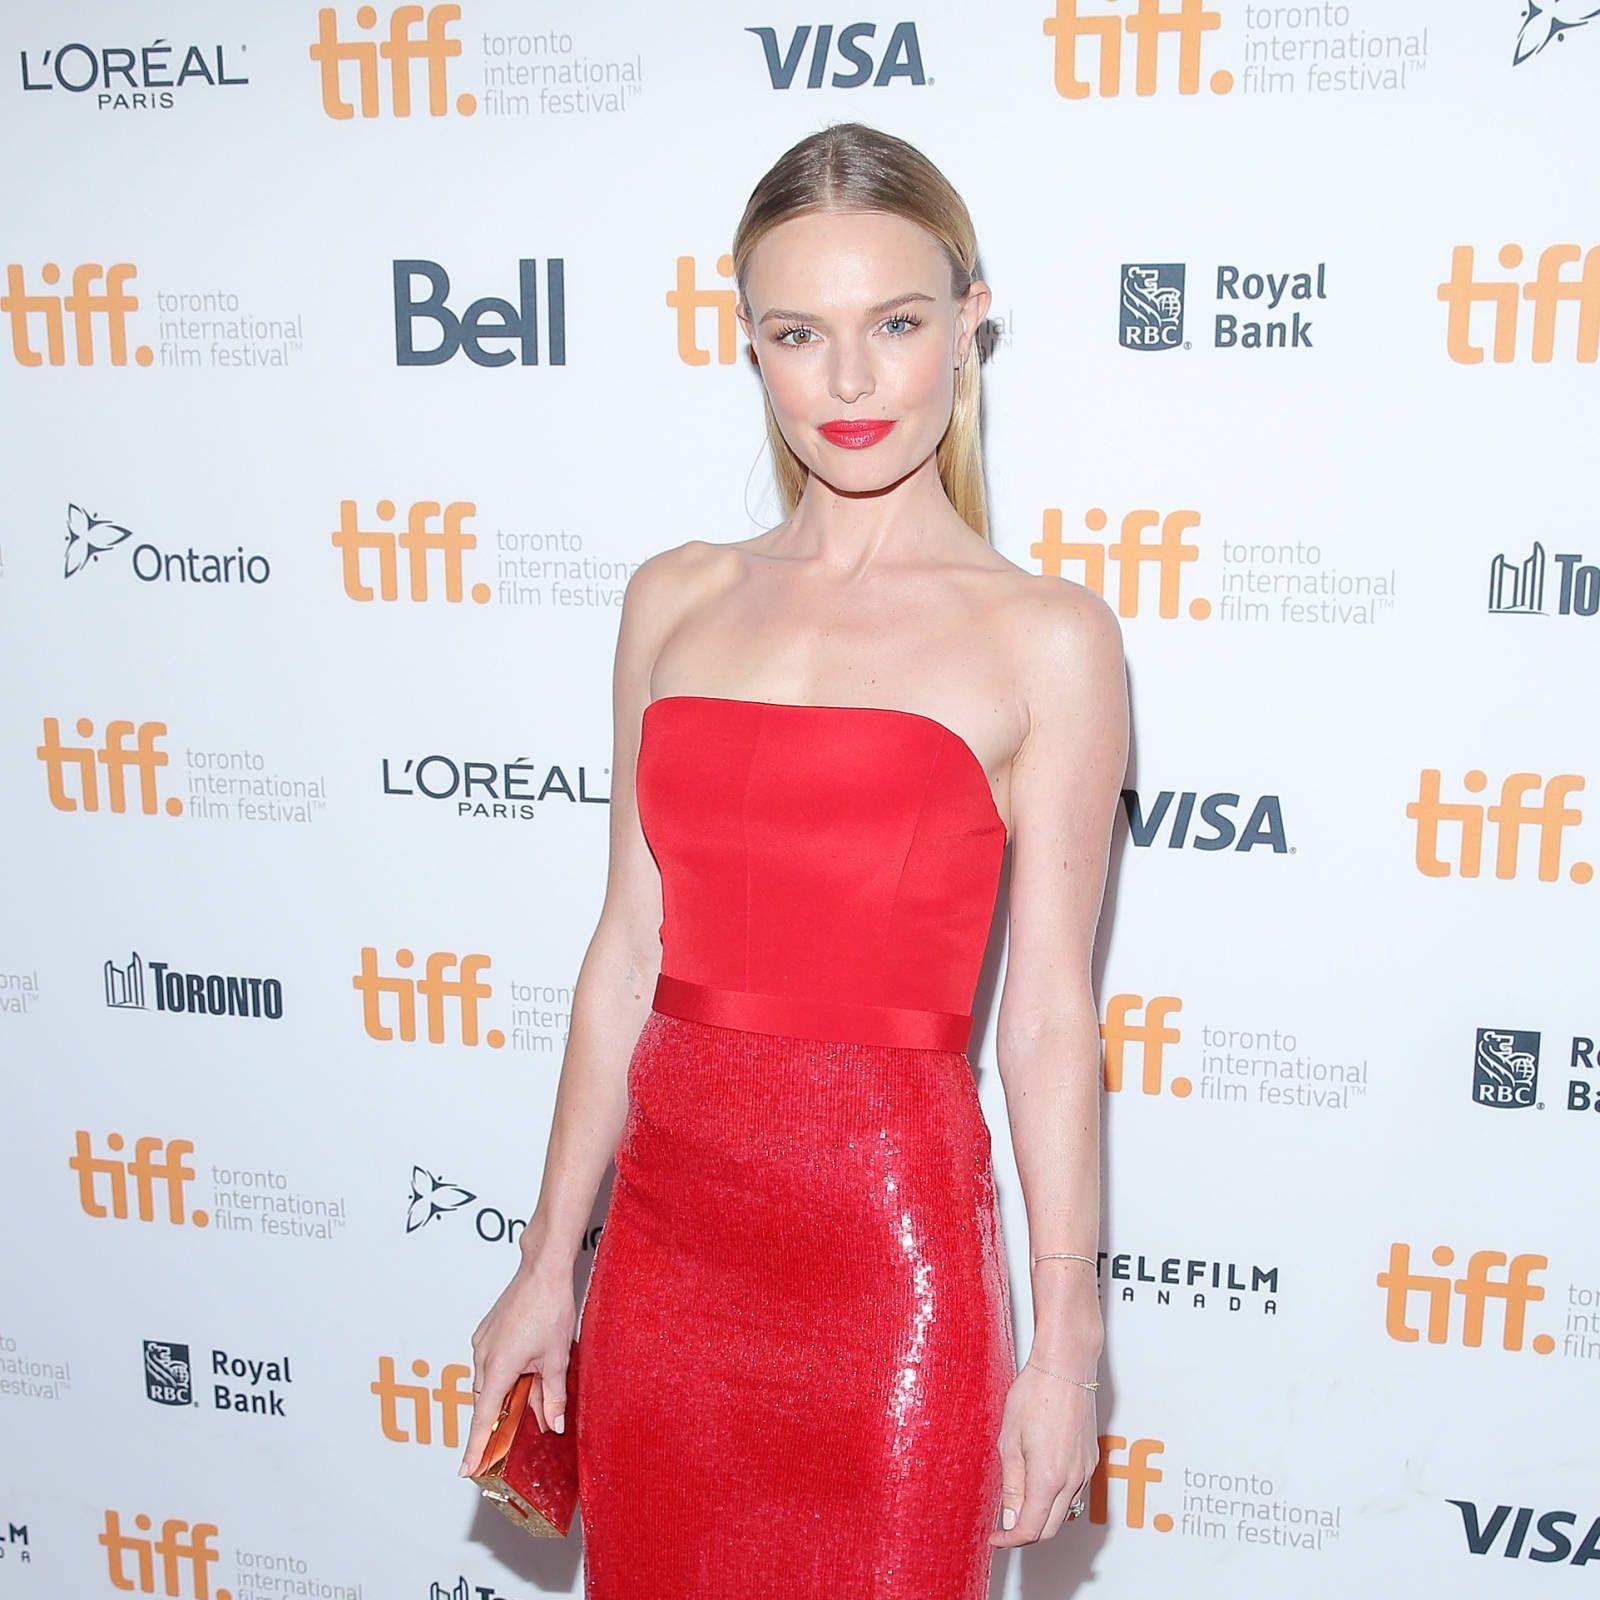 Kate Bosworth at the Toronto Film Festival 2014